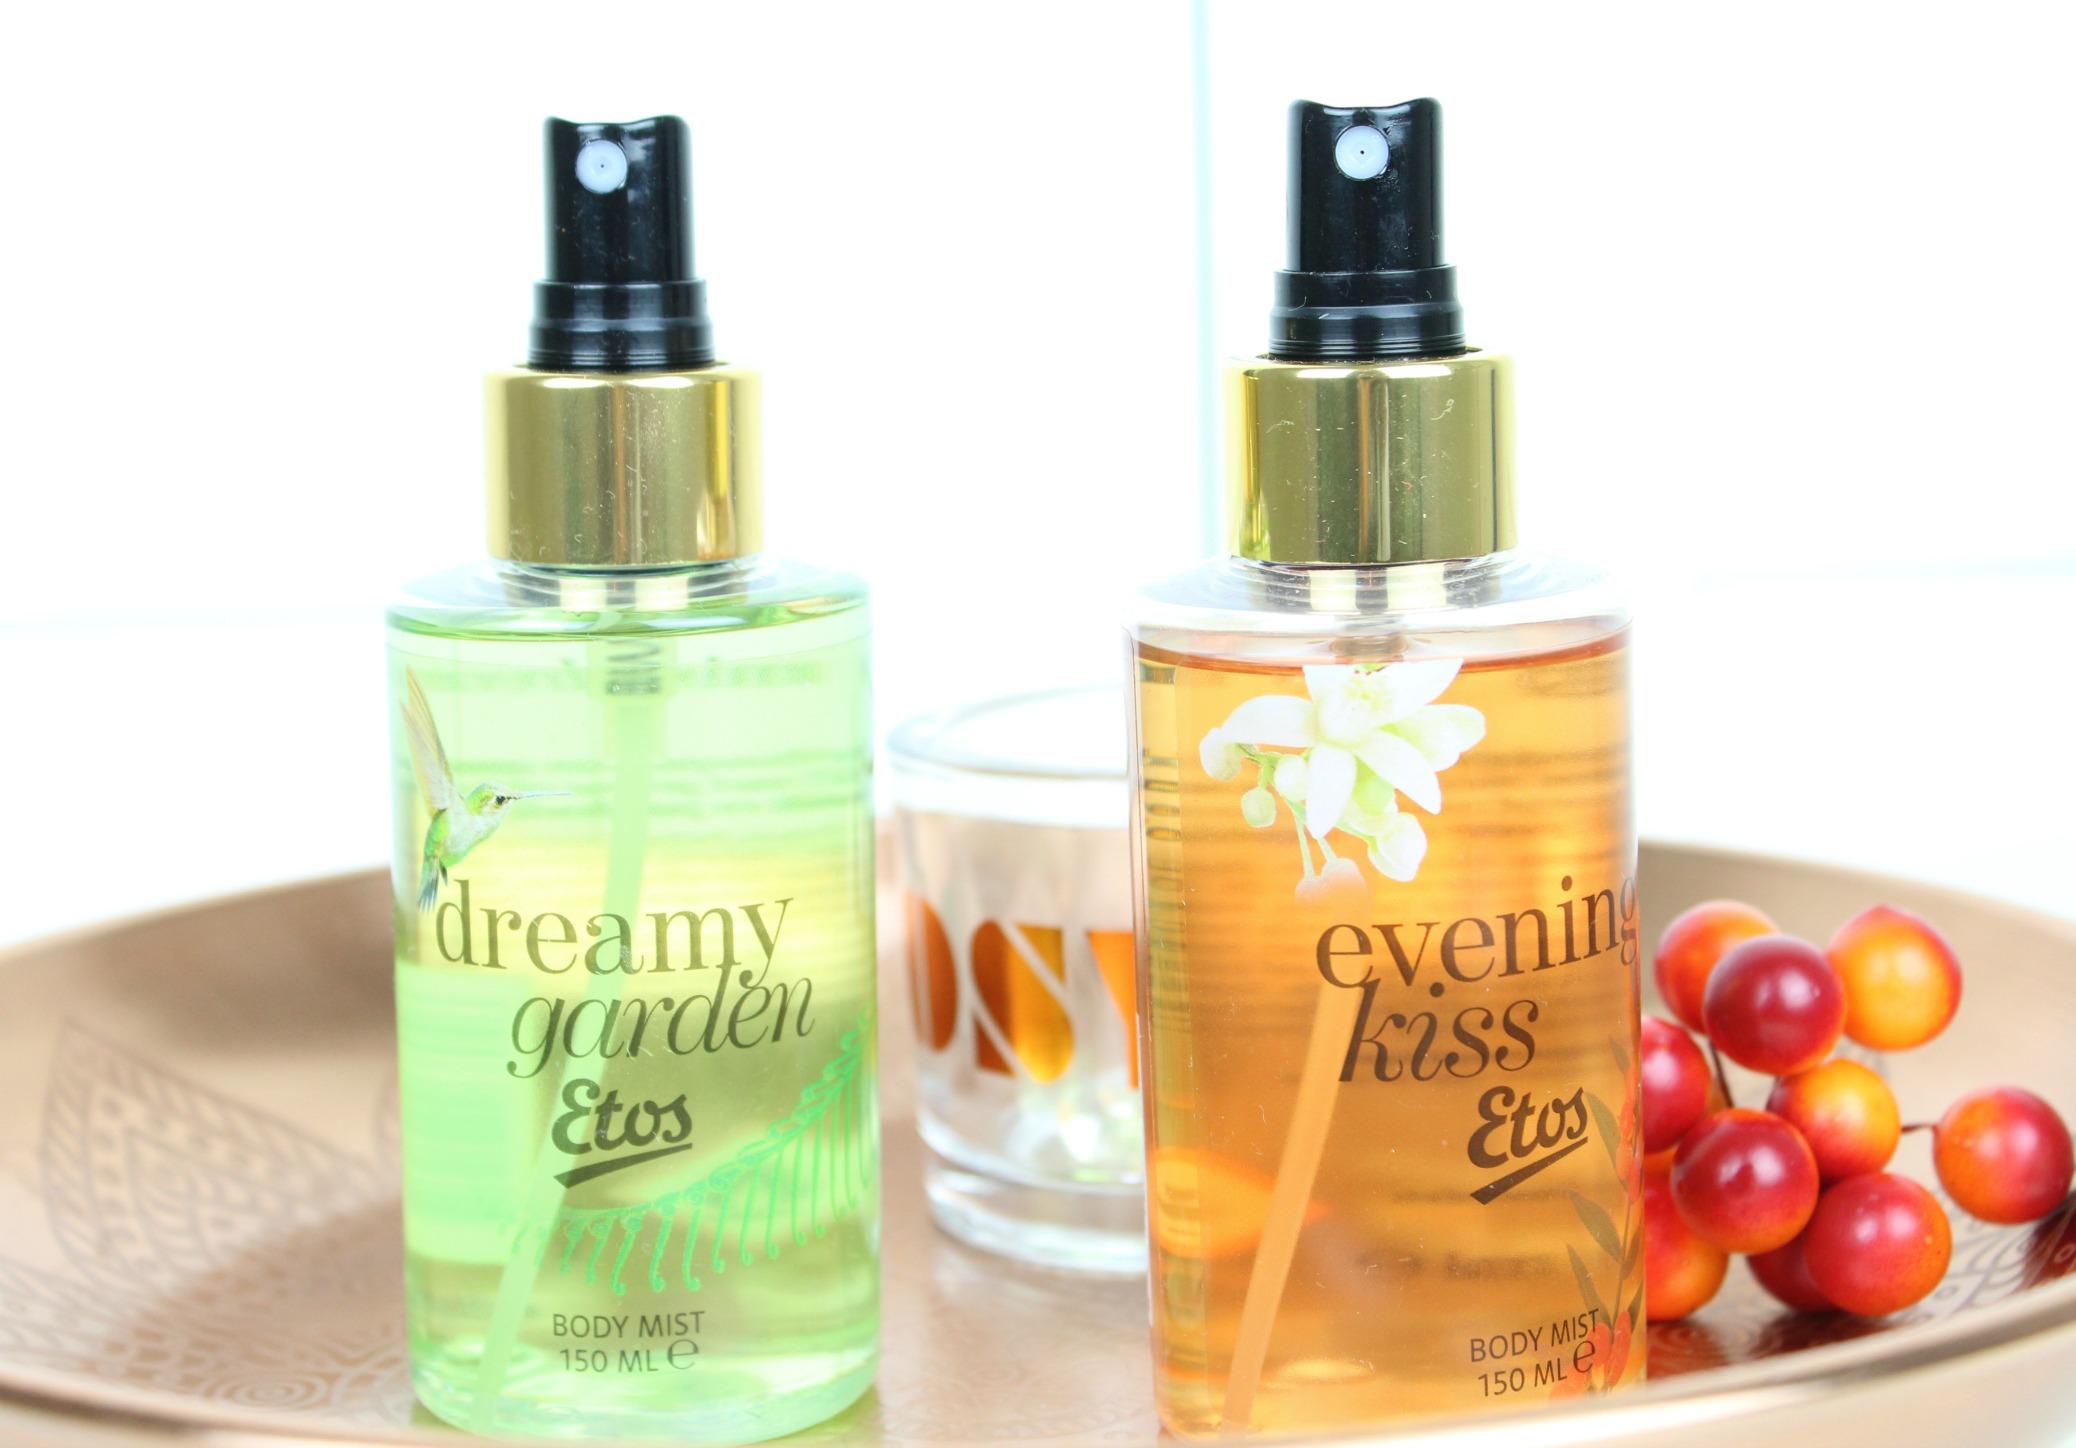 etos-evening-kiss-dreamy-garden-body-mist_goodgirlscompany